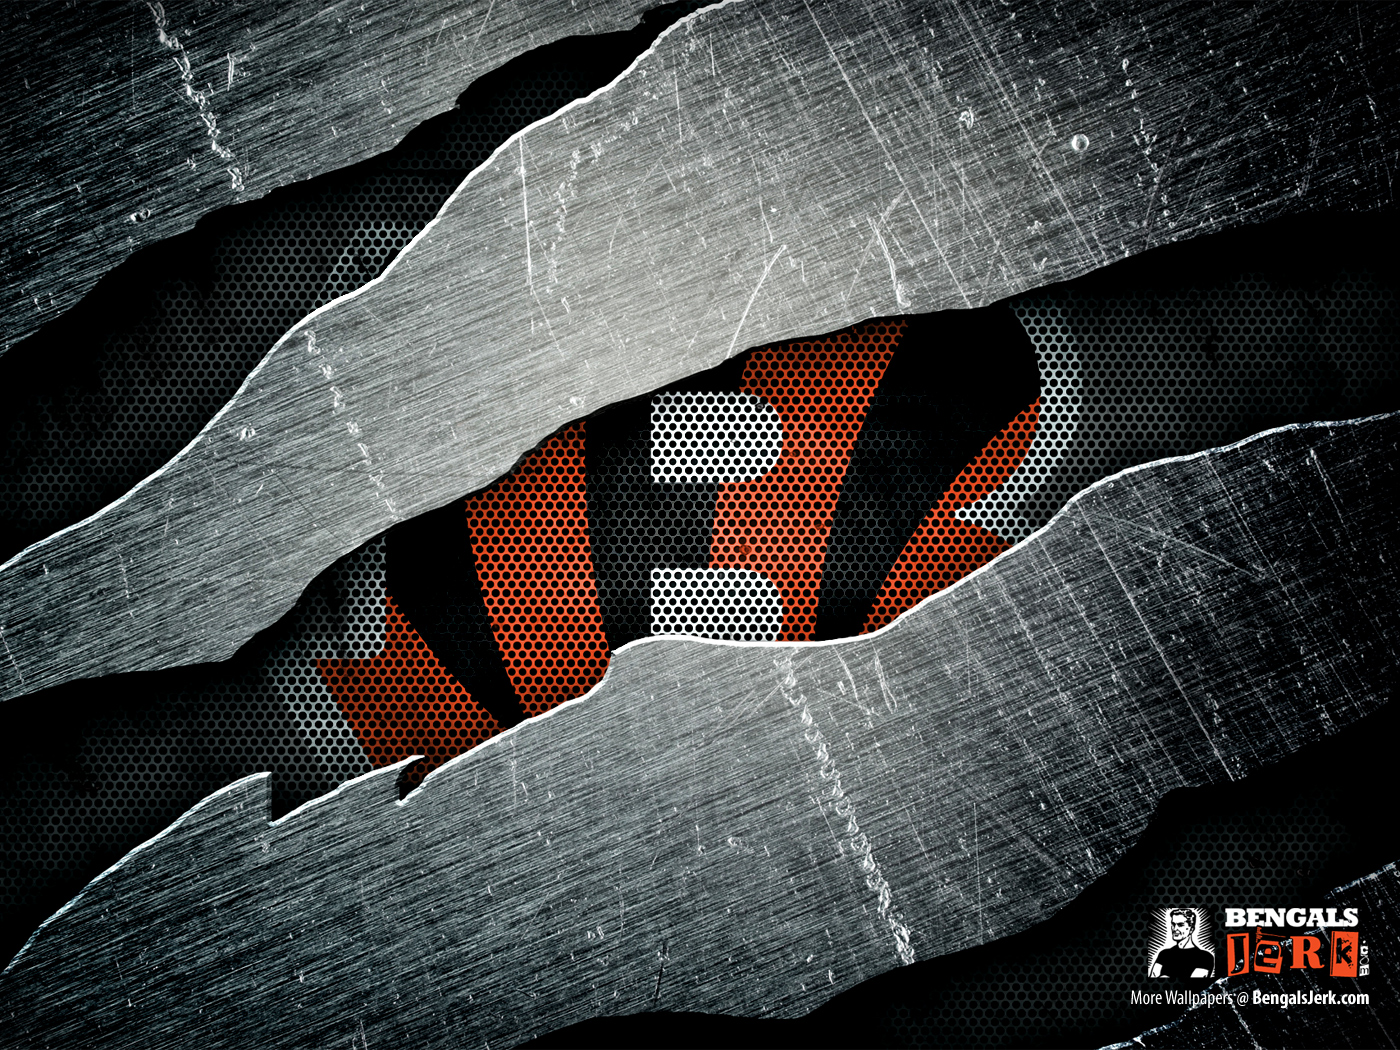 Raiders Wallpaper 3d Koenigsegg Logo Wallpaper 1024x768 27750